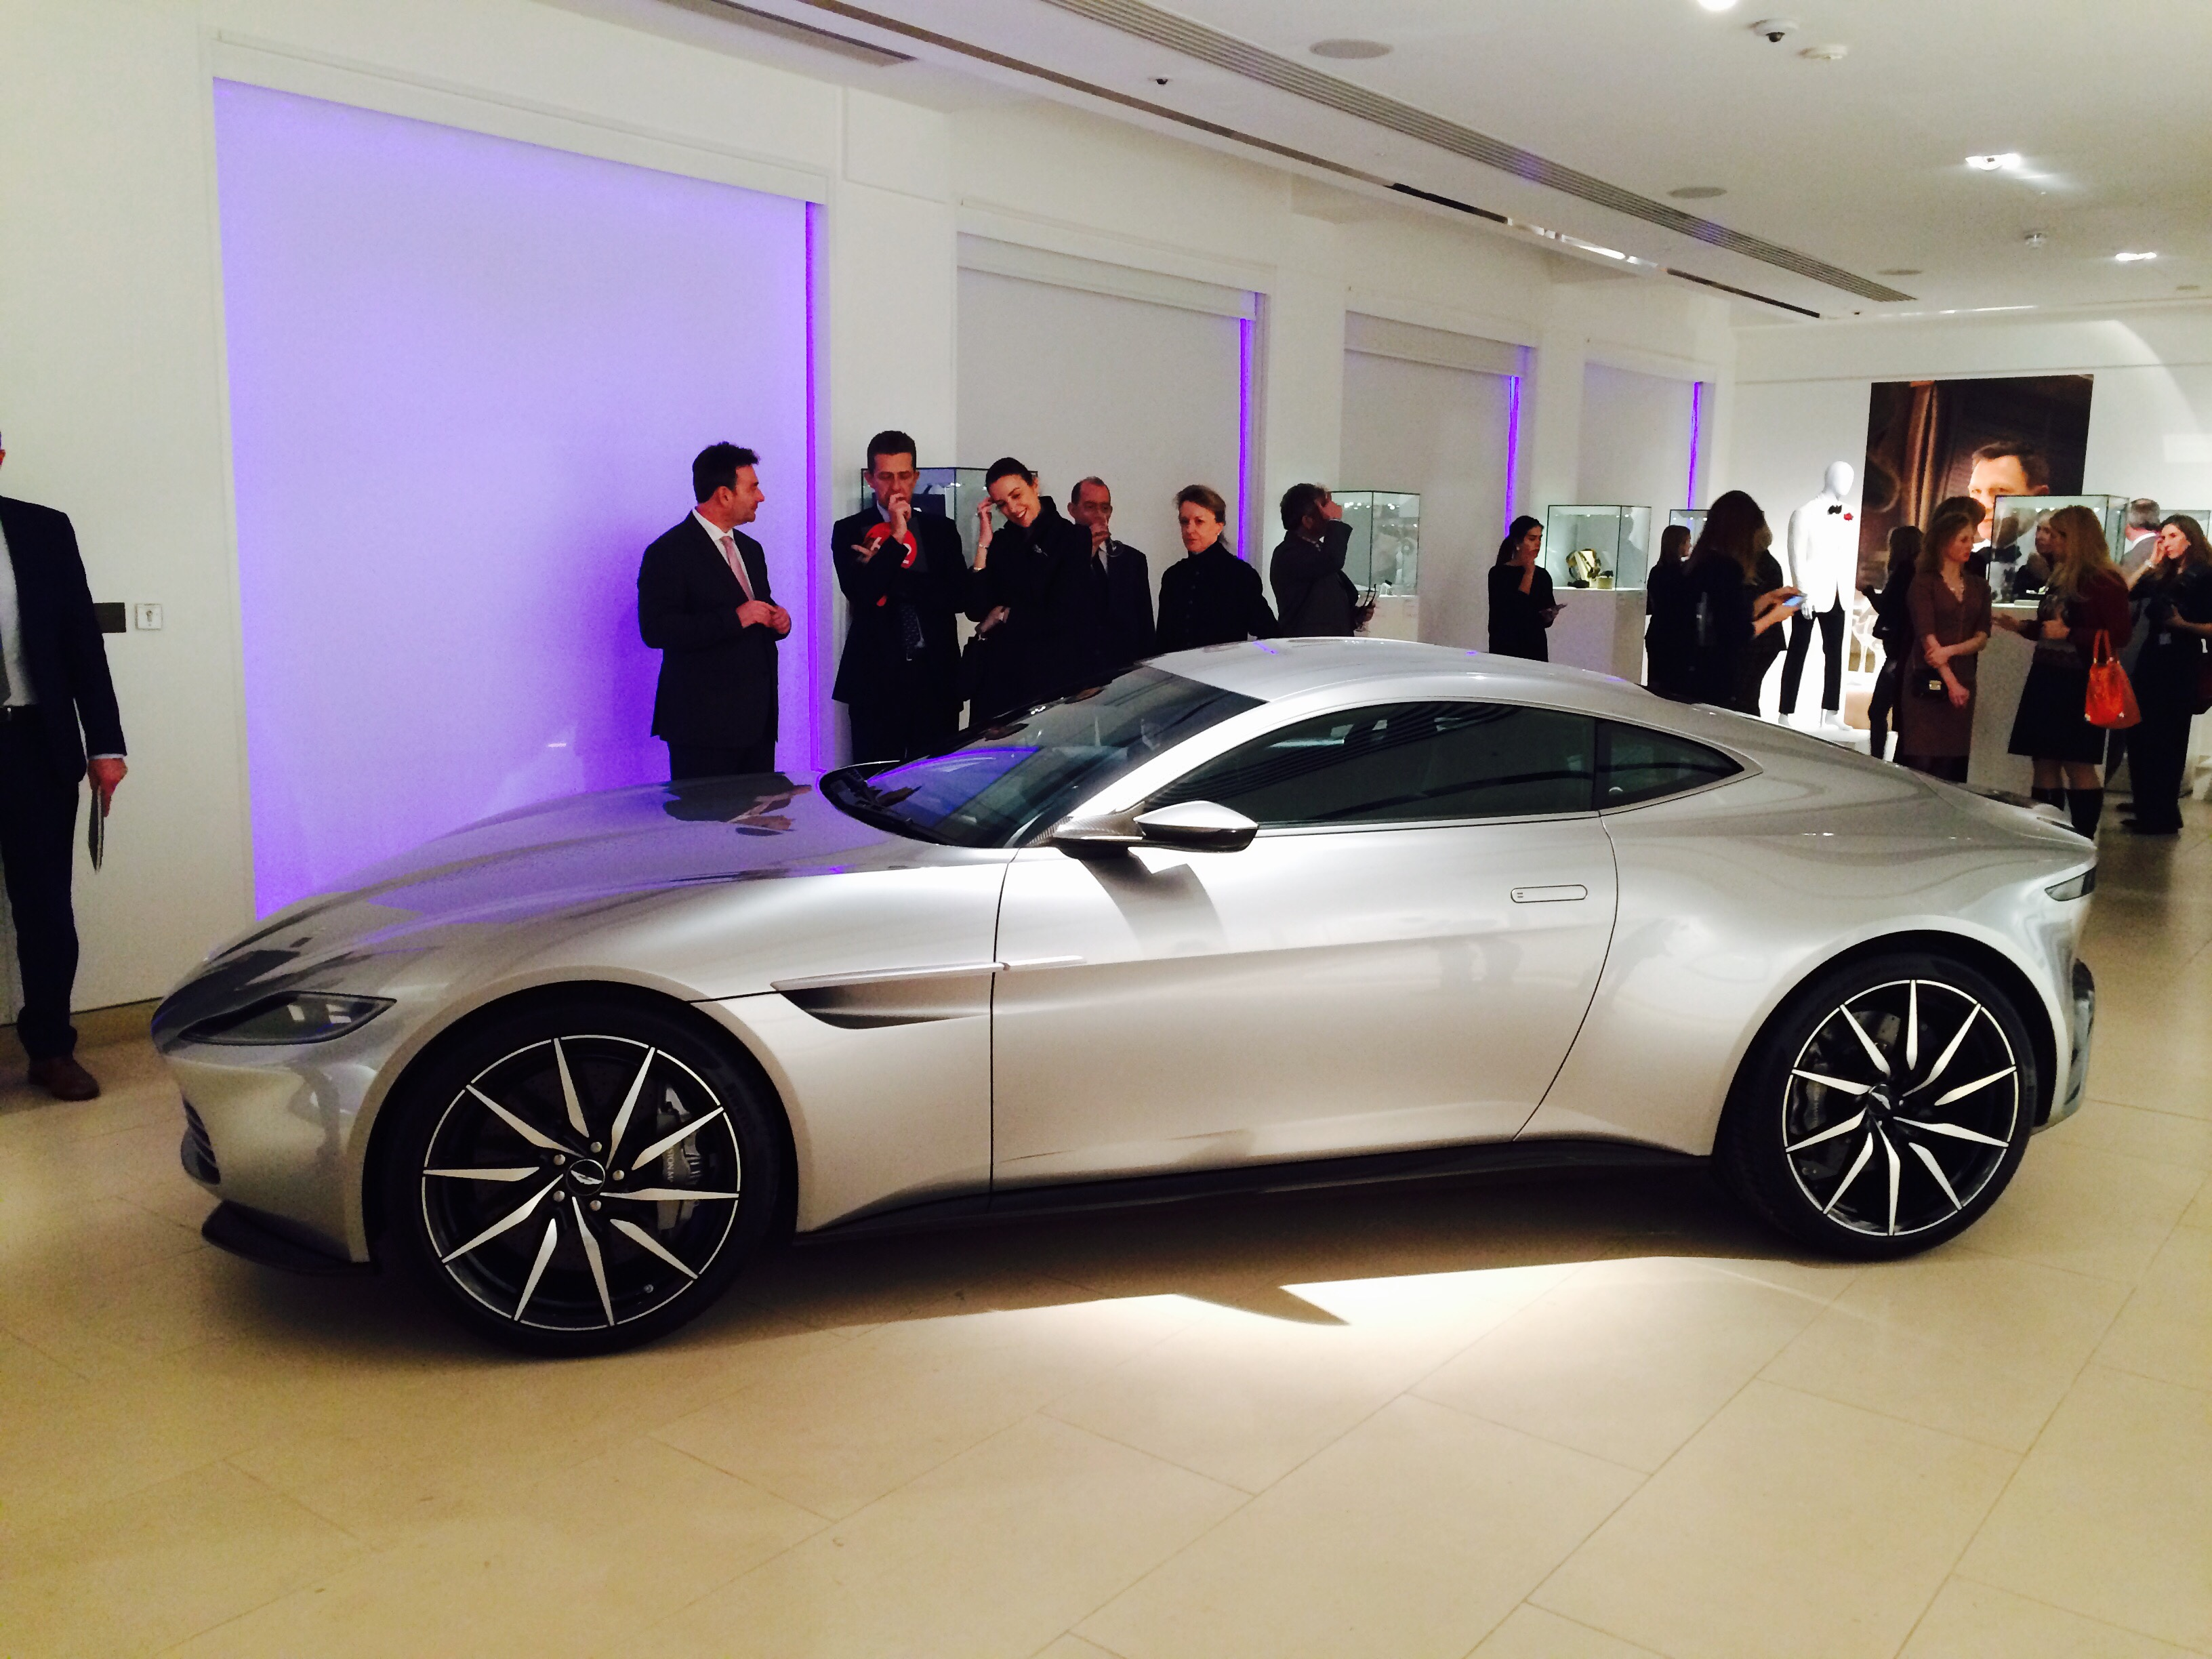 James Bond S Aston Martin Db10 Sold For 2 434 500 Autocar